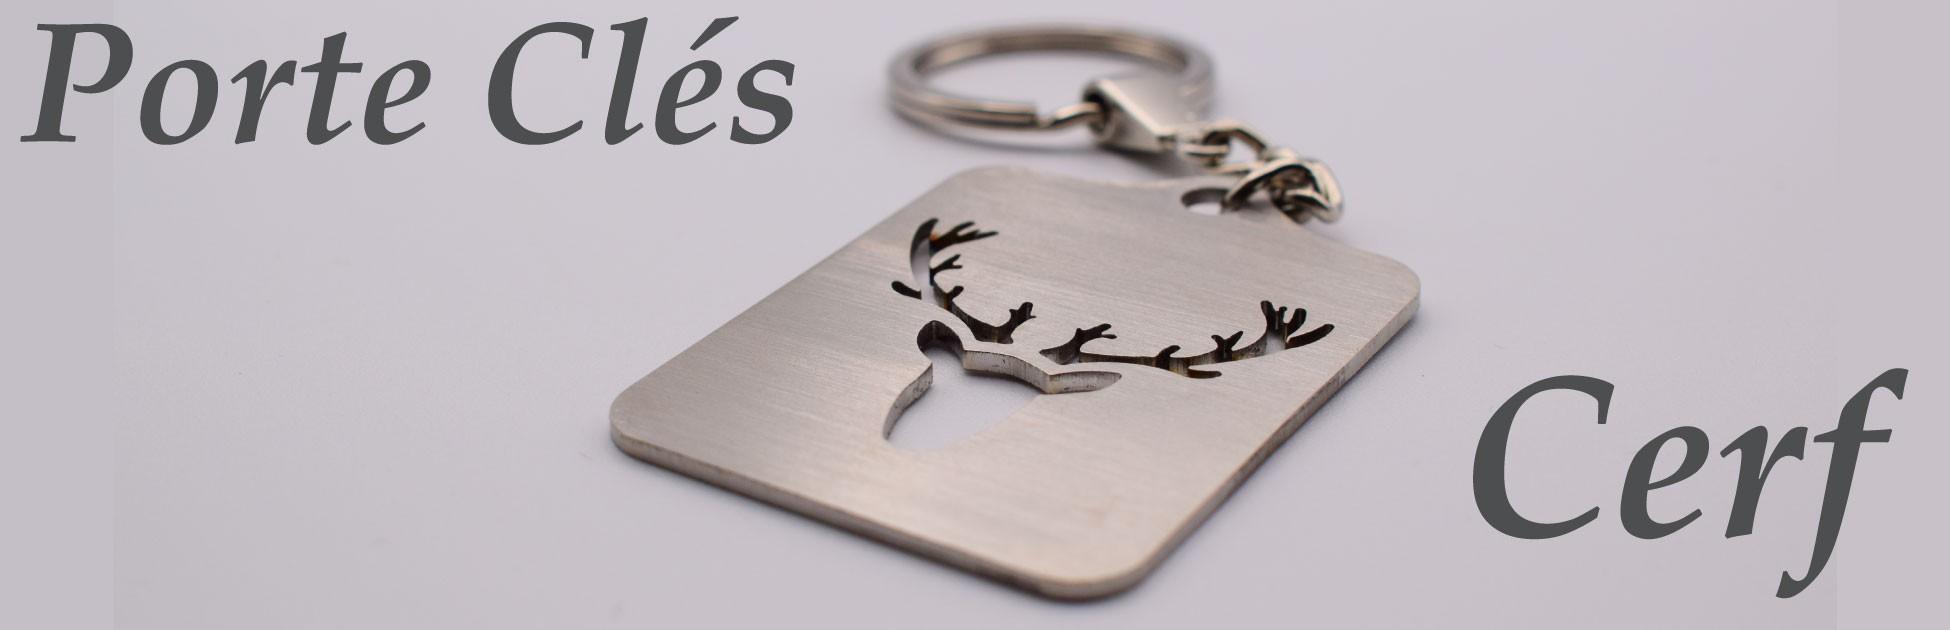 Porte clés Cerf